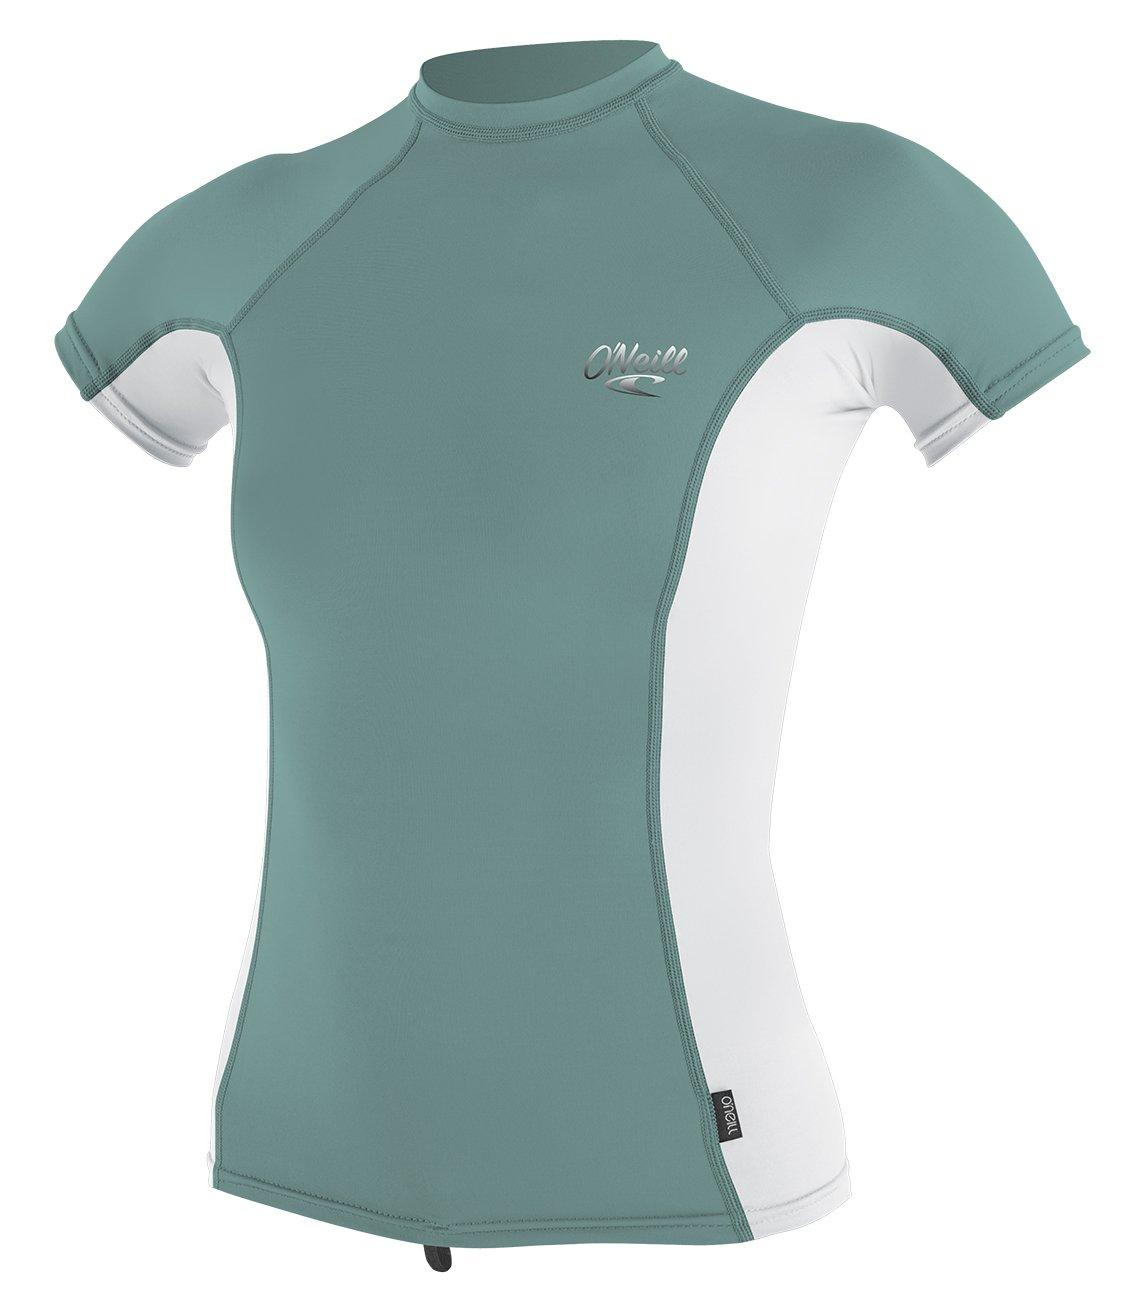 O'Neill Women's Premium Skins UPF 50+ Short Sleeve Rash Guard O'Neill